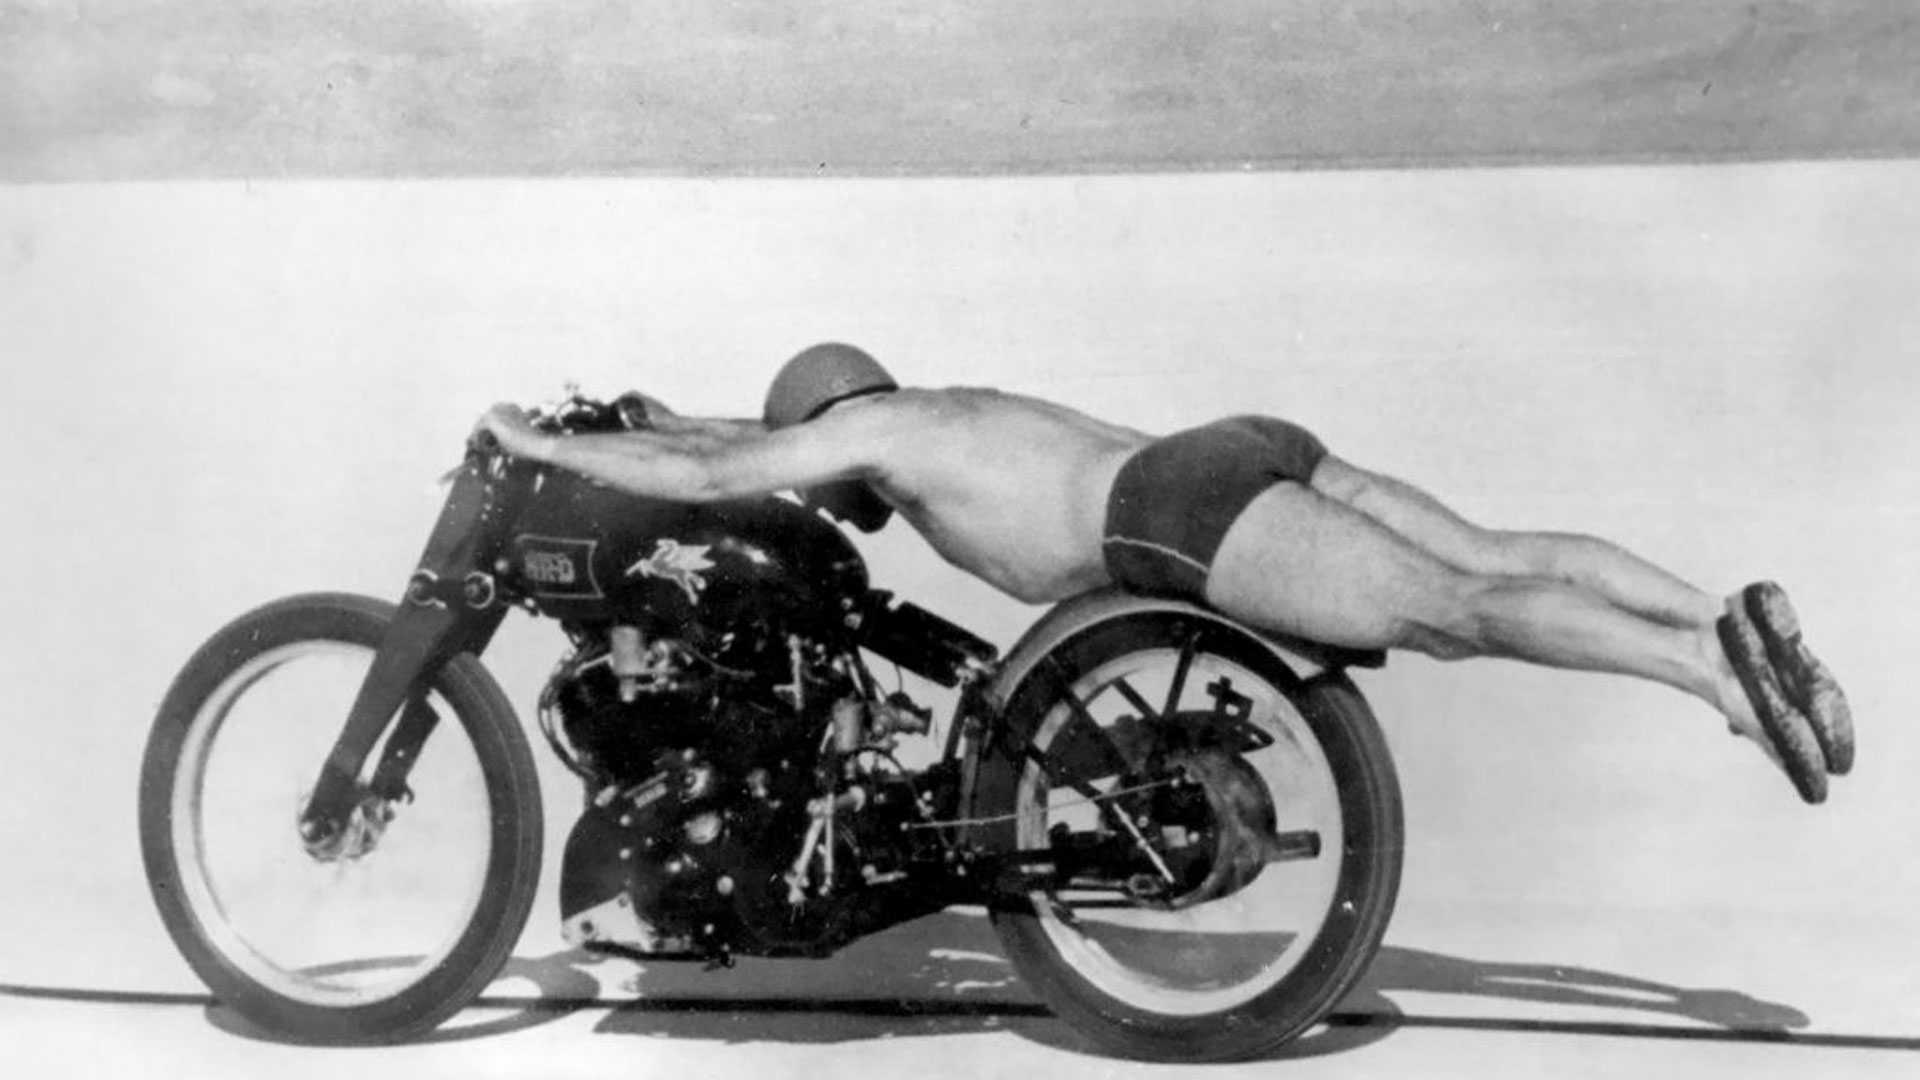 The Widowmakers Top Ten Most Frightening Motorcycles To Ride